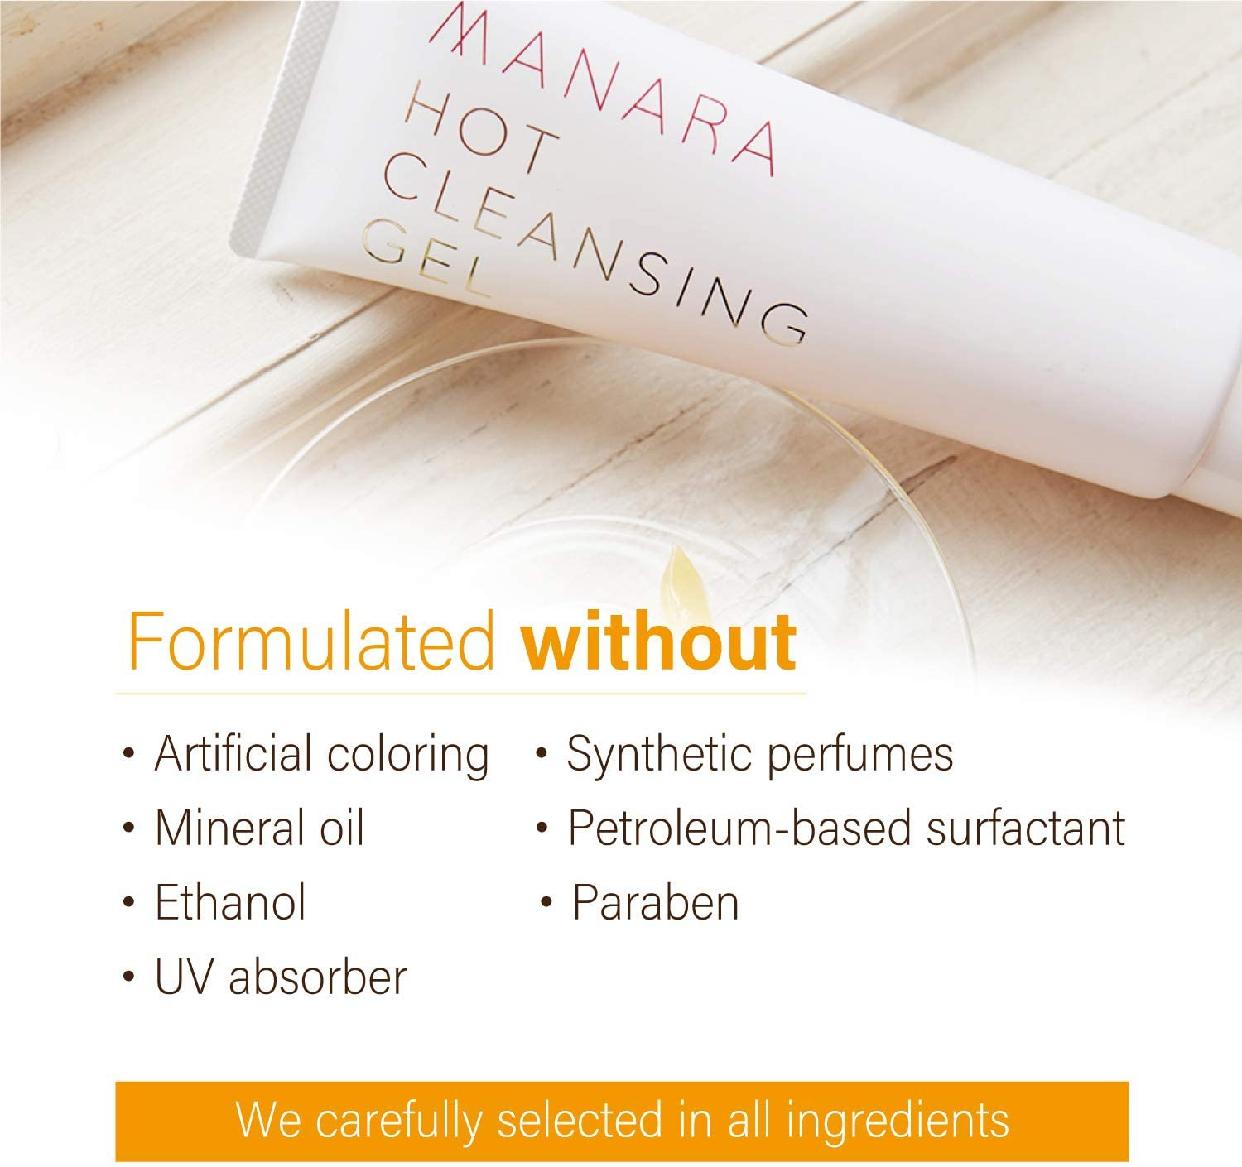 MANARA(マナラ)ホットクレンジングゲルの商品画像3